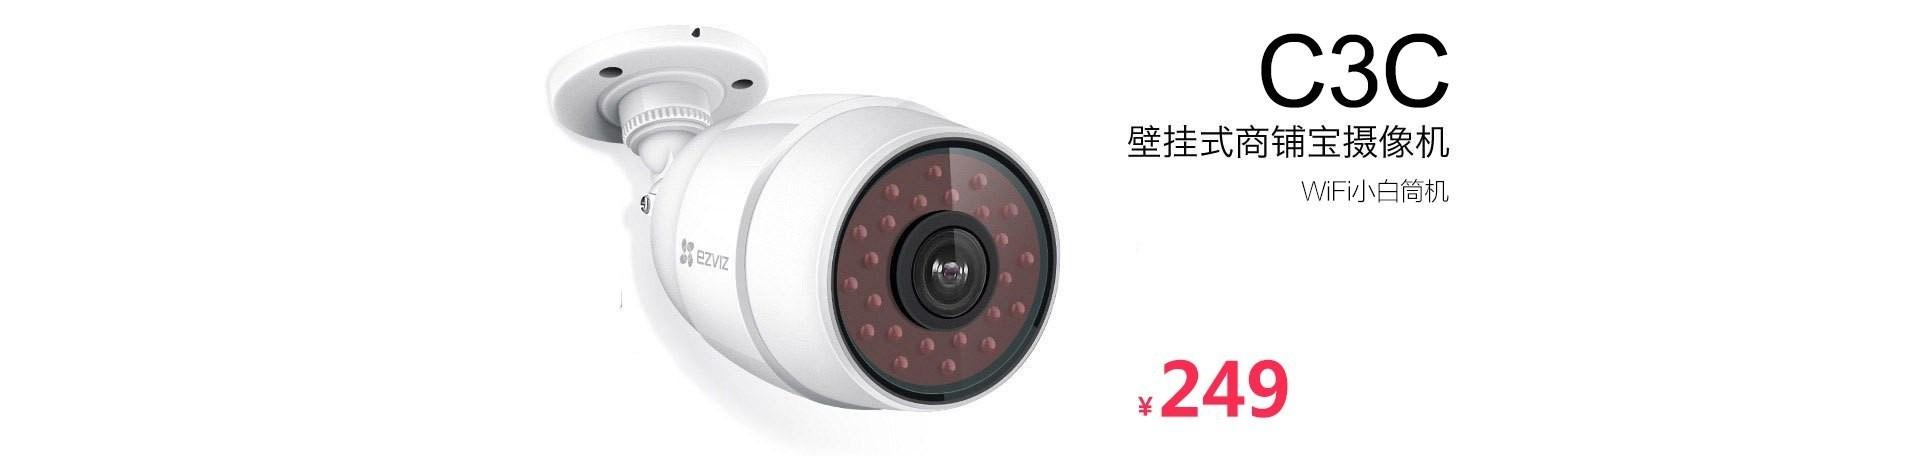 C3C壁挂式商铺宝摄像机